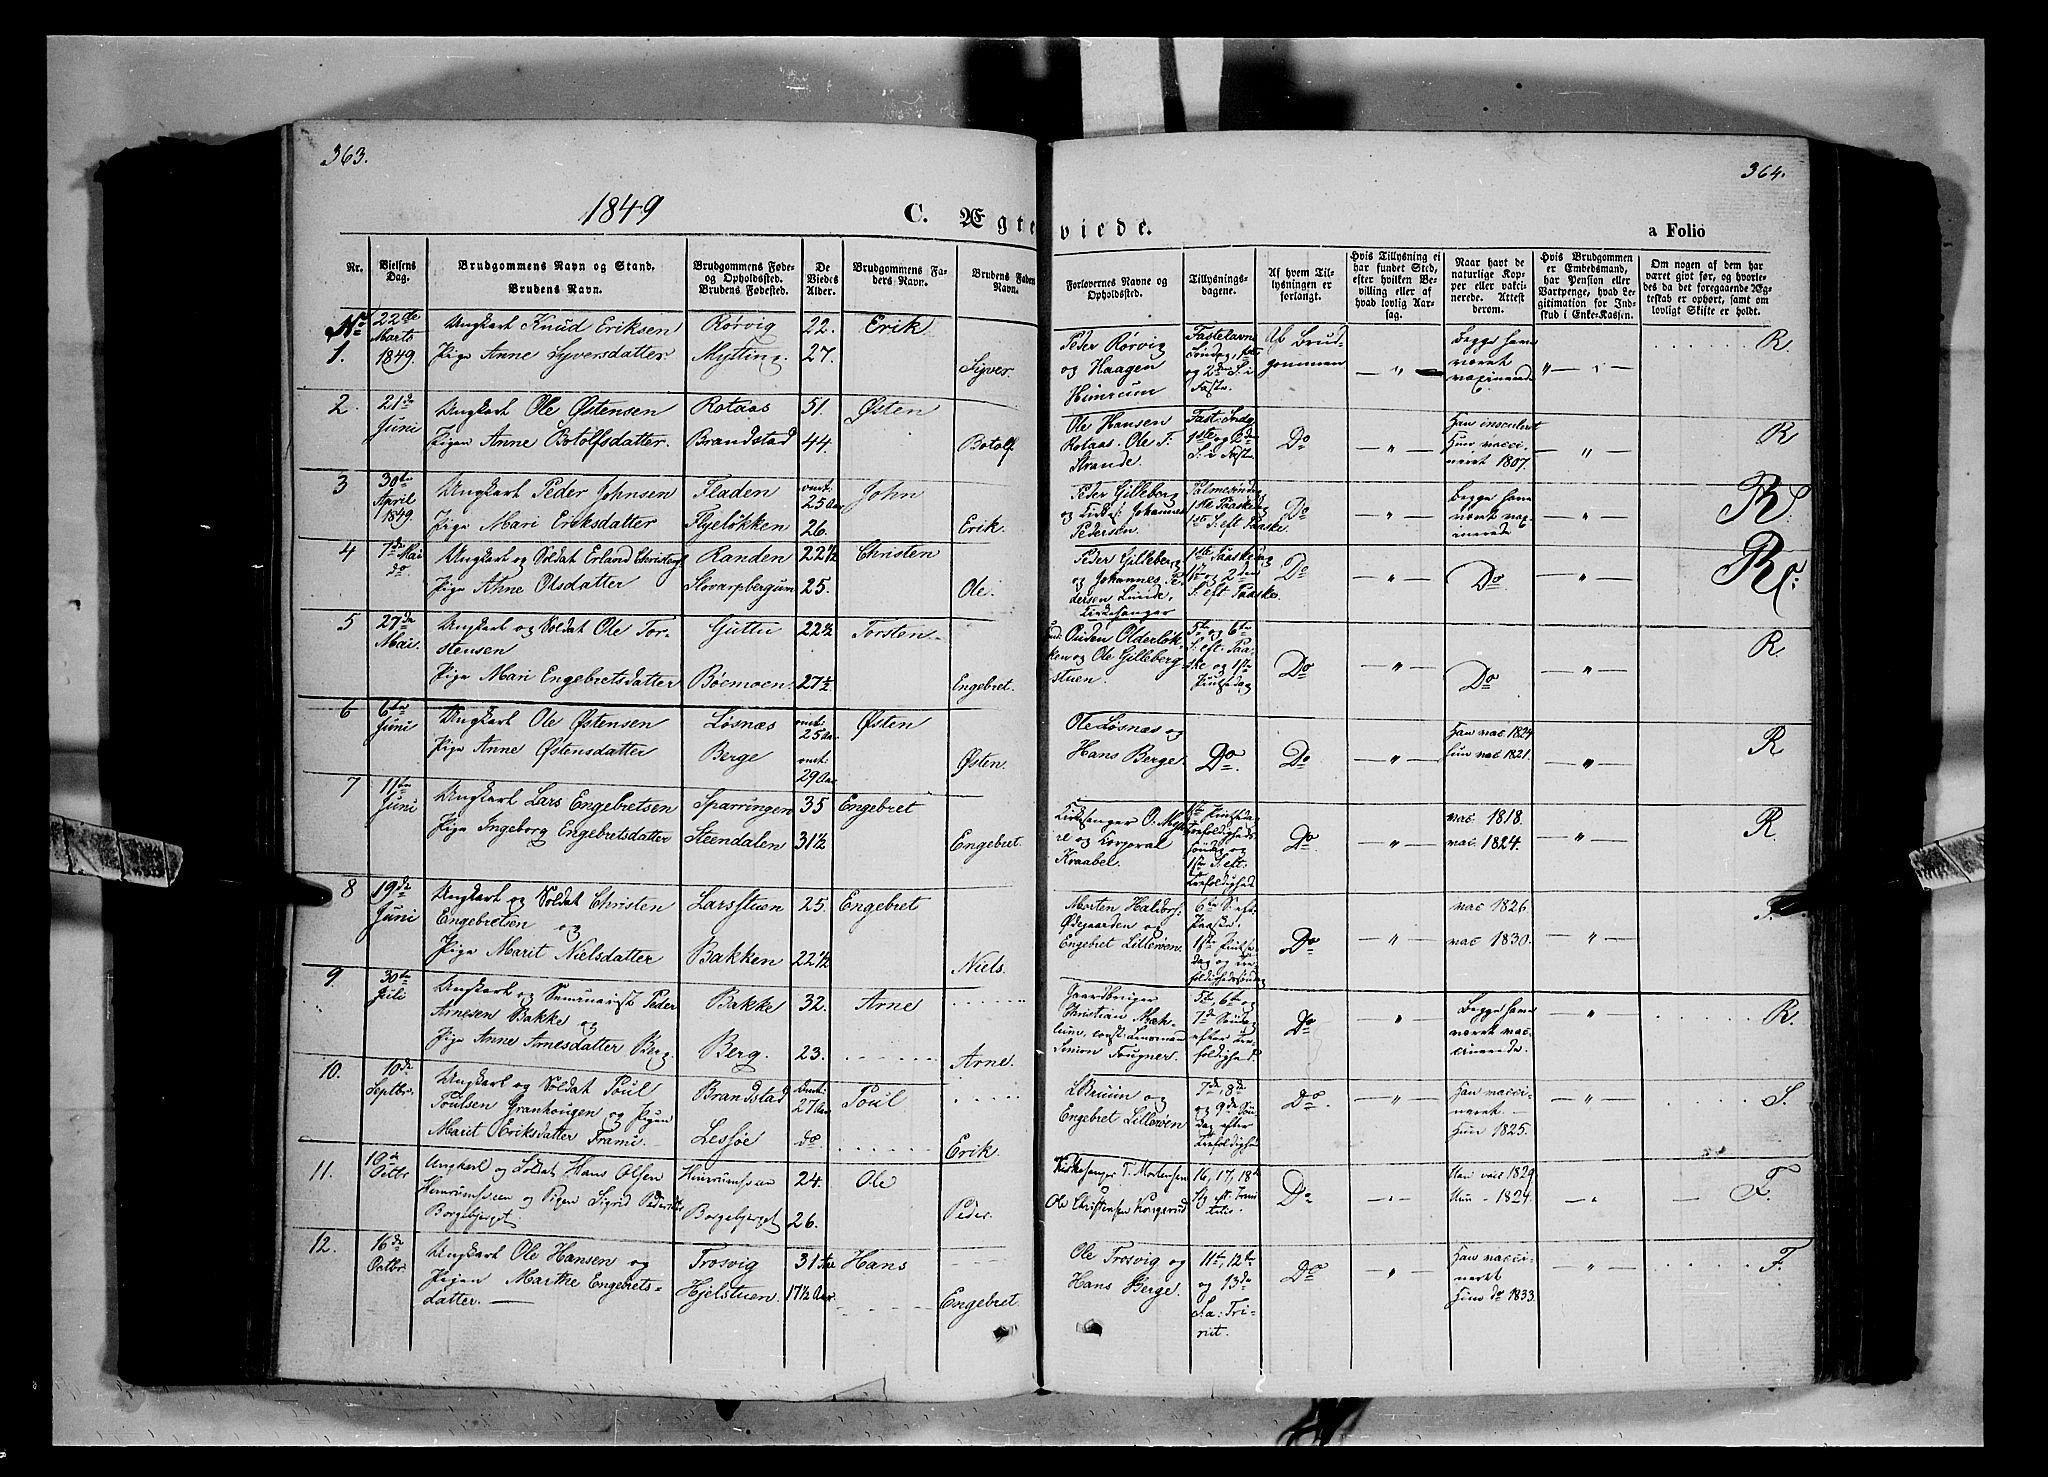 SAH, Ringebu prestekontor, Ministerialbok nr. 6, 1848-1859, s. 363-364